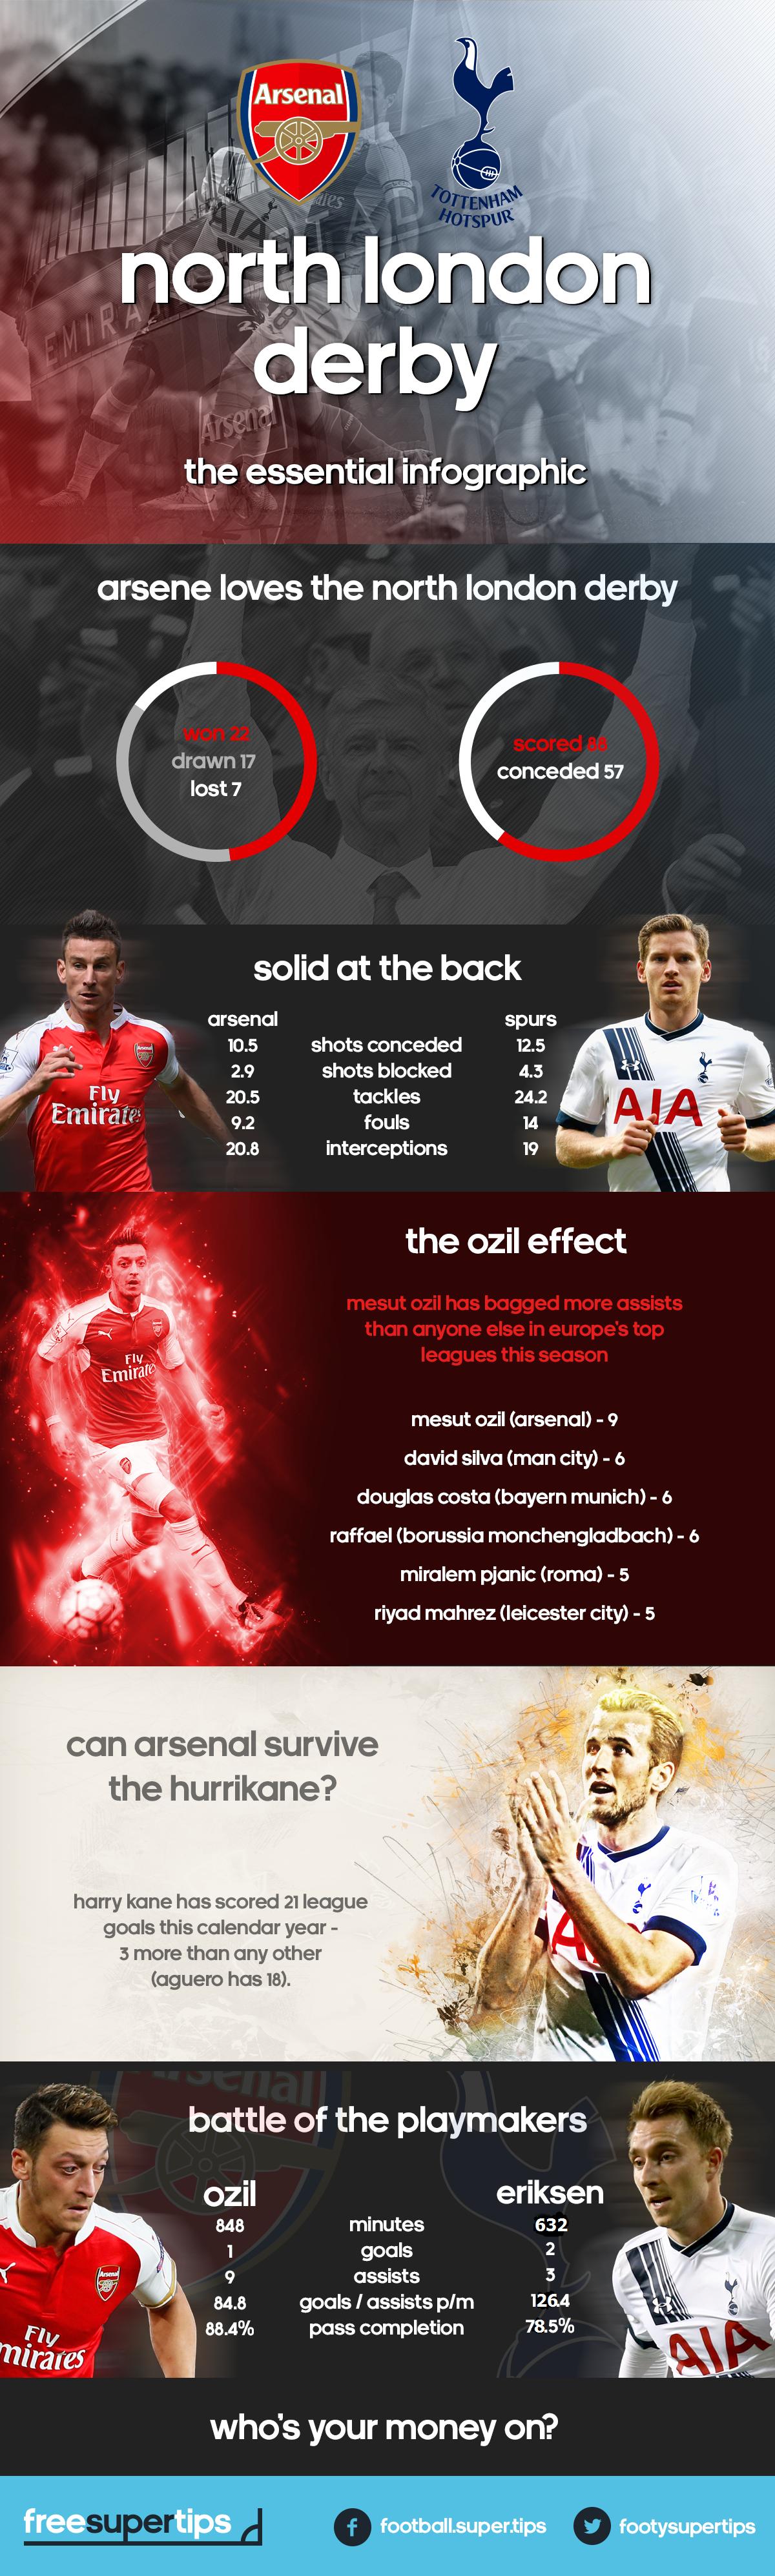 infographic_NorthLondon1